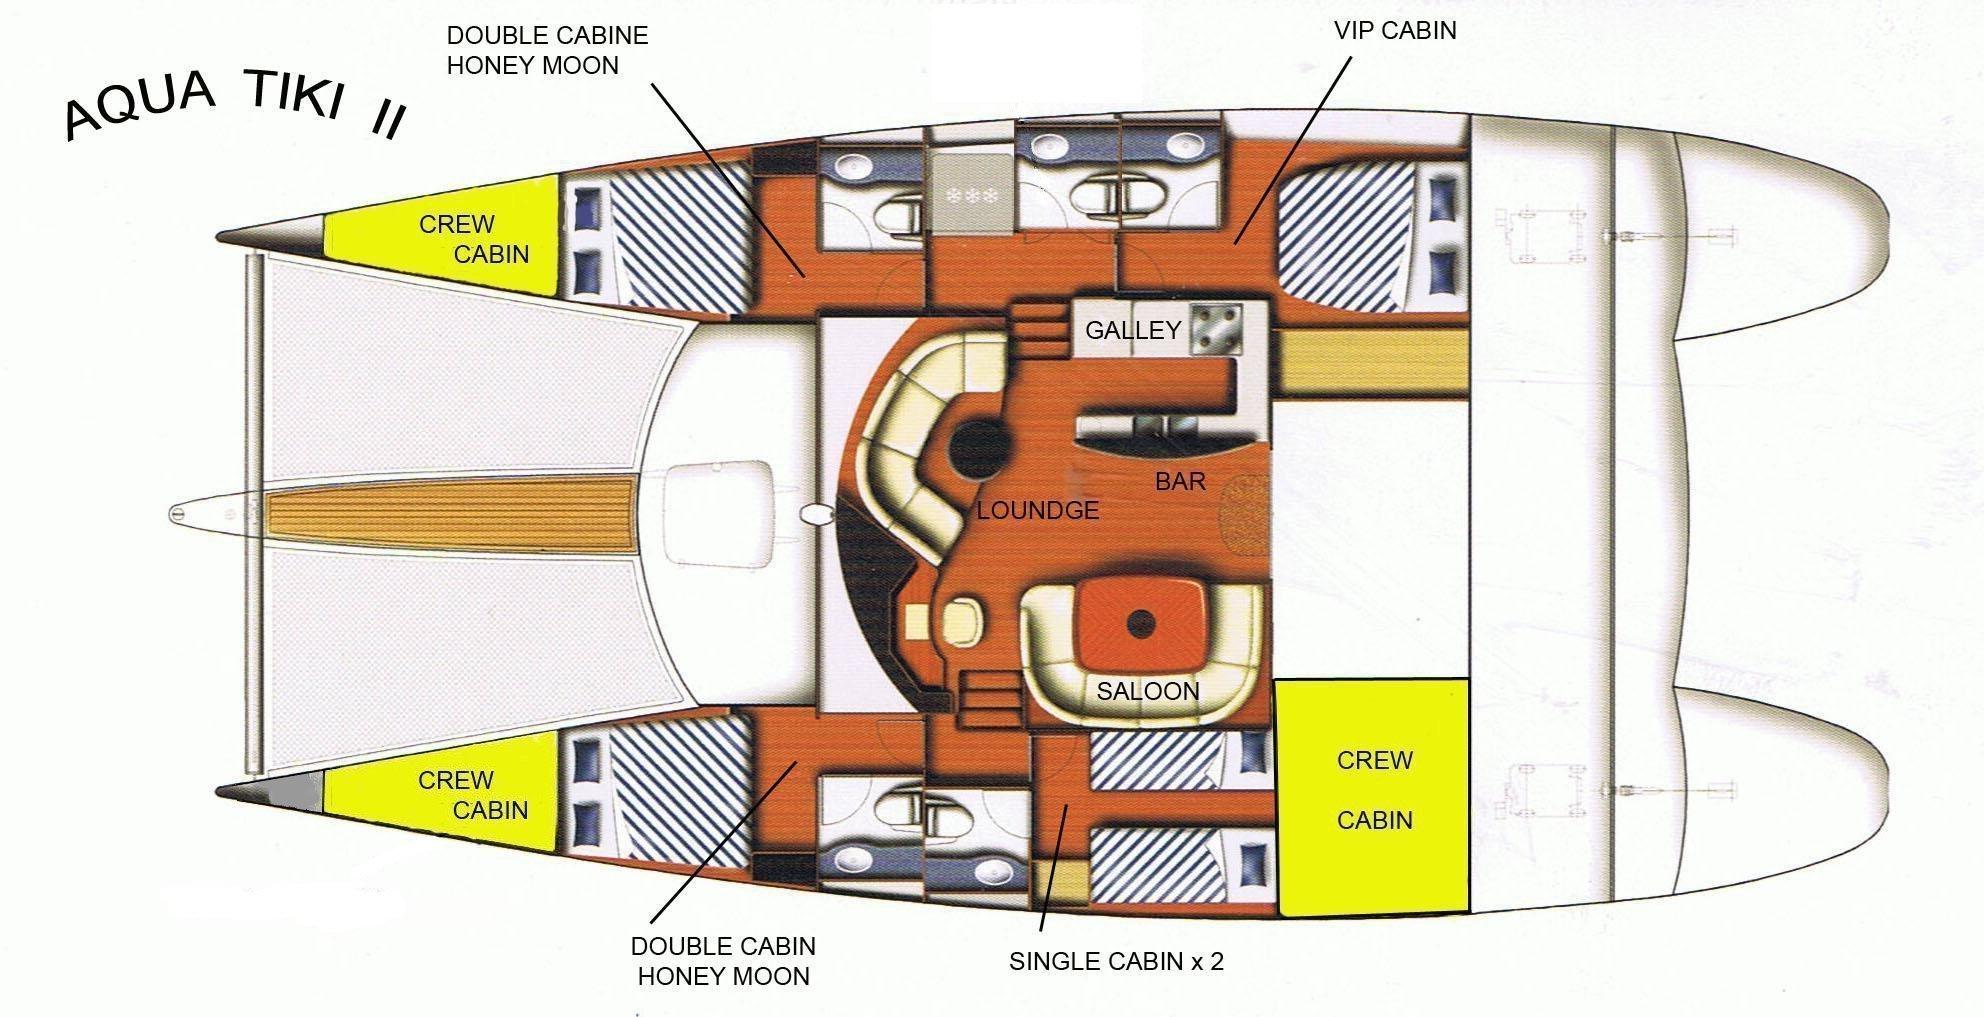 Boat layout for Aqua Tiki II